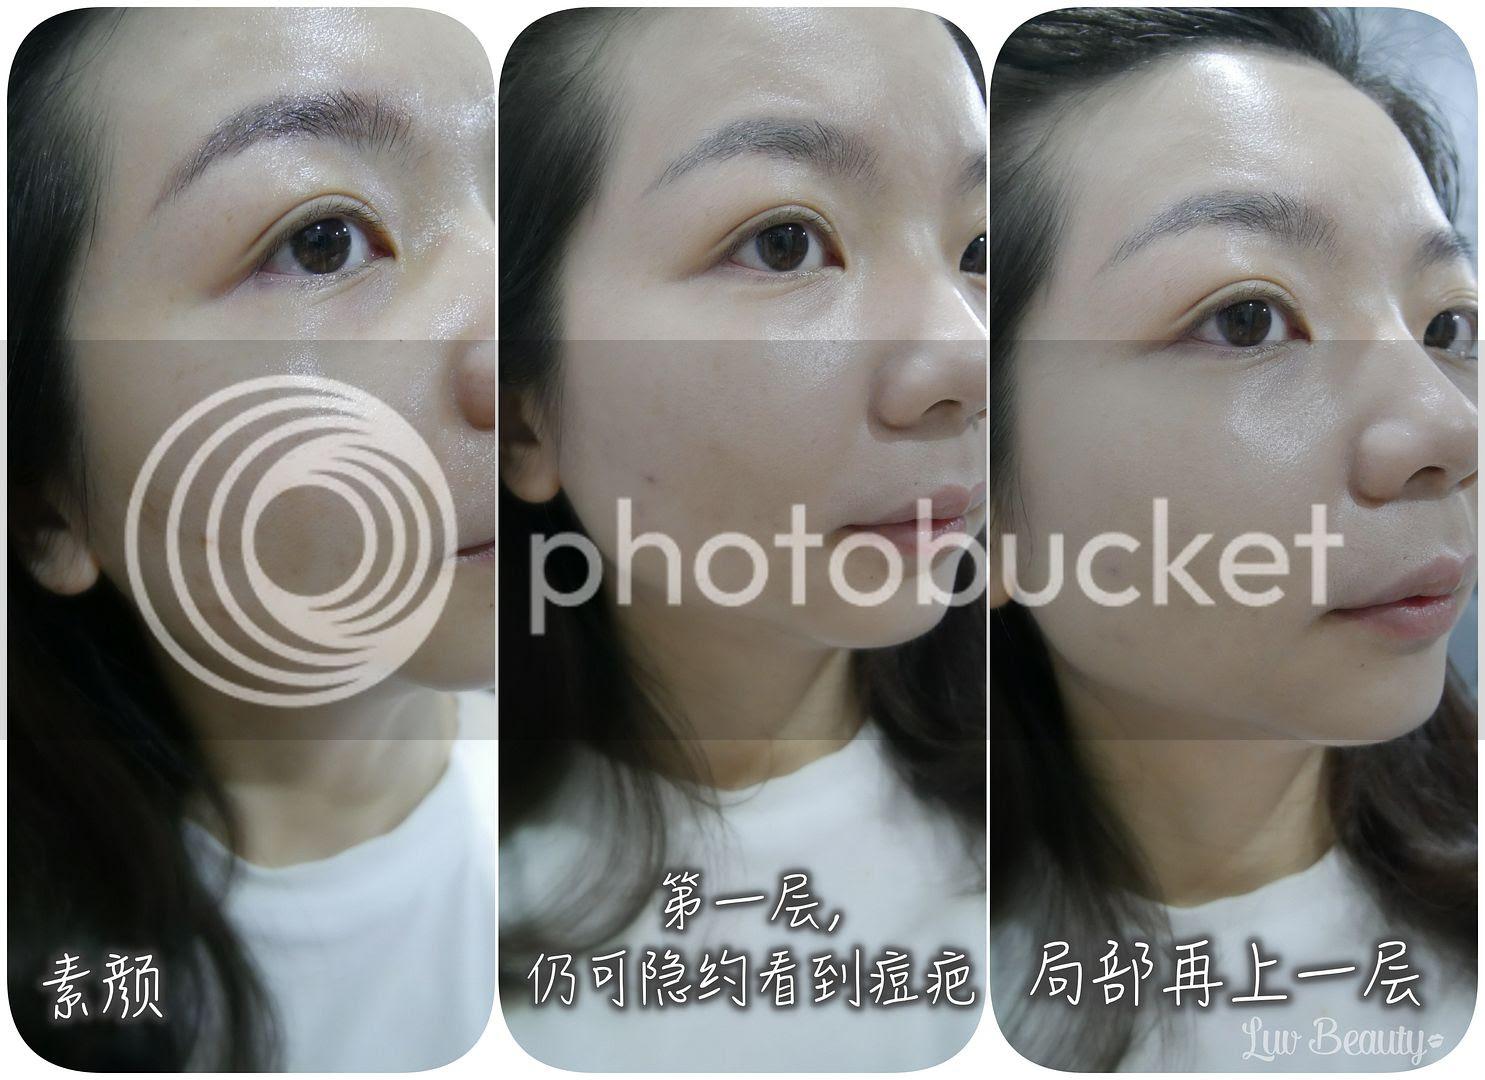 photo collage2_zps1mwb09pi.jpg